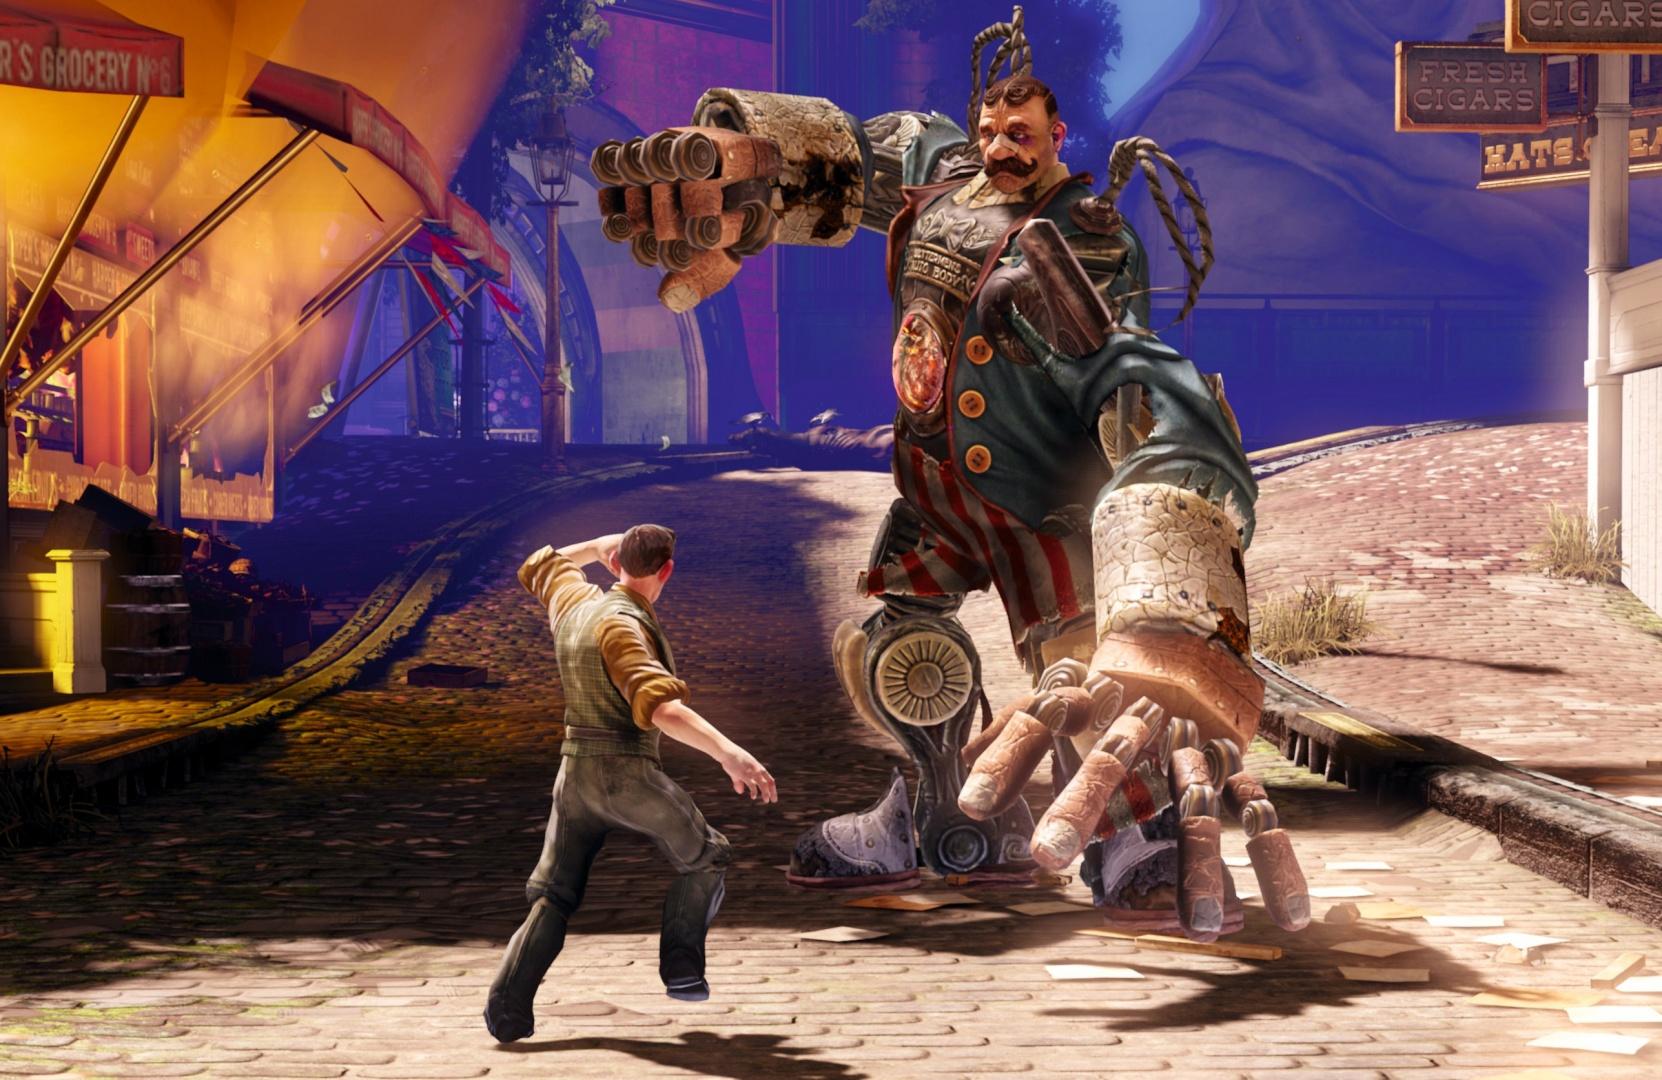 Bioshock-Infinite-interview-3